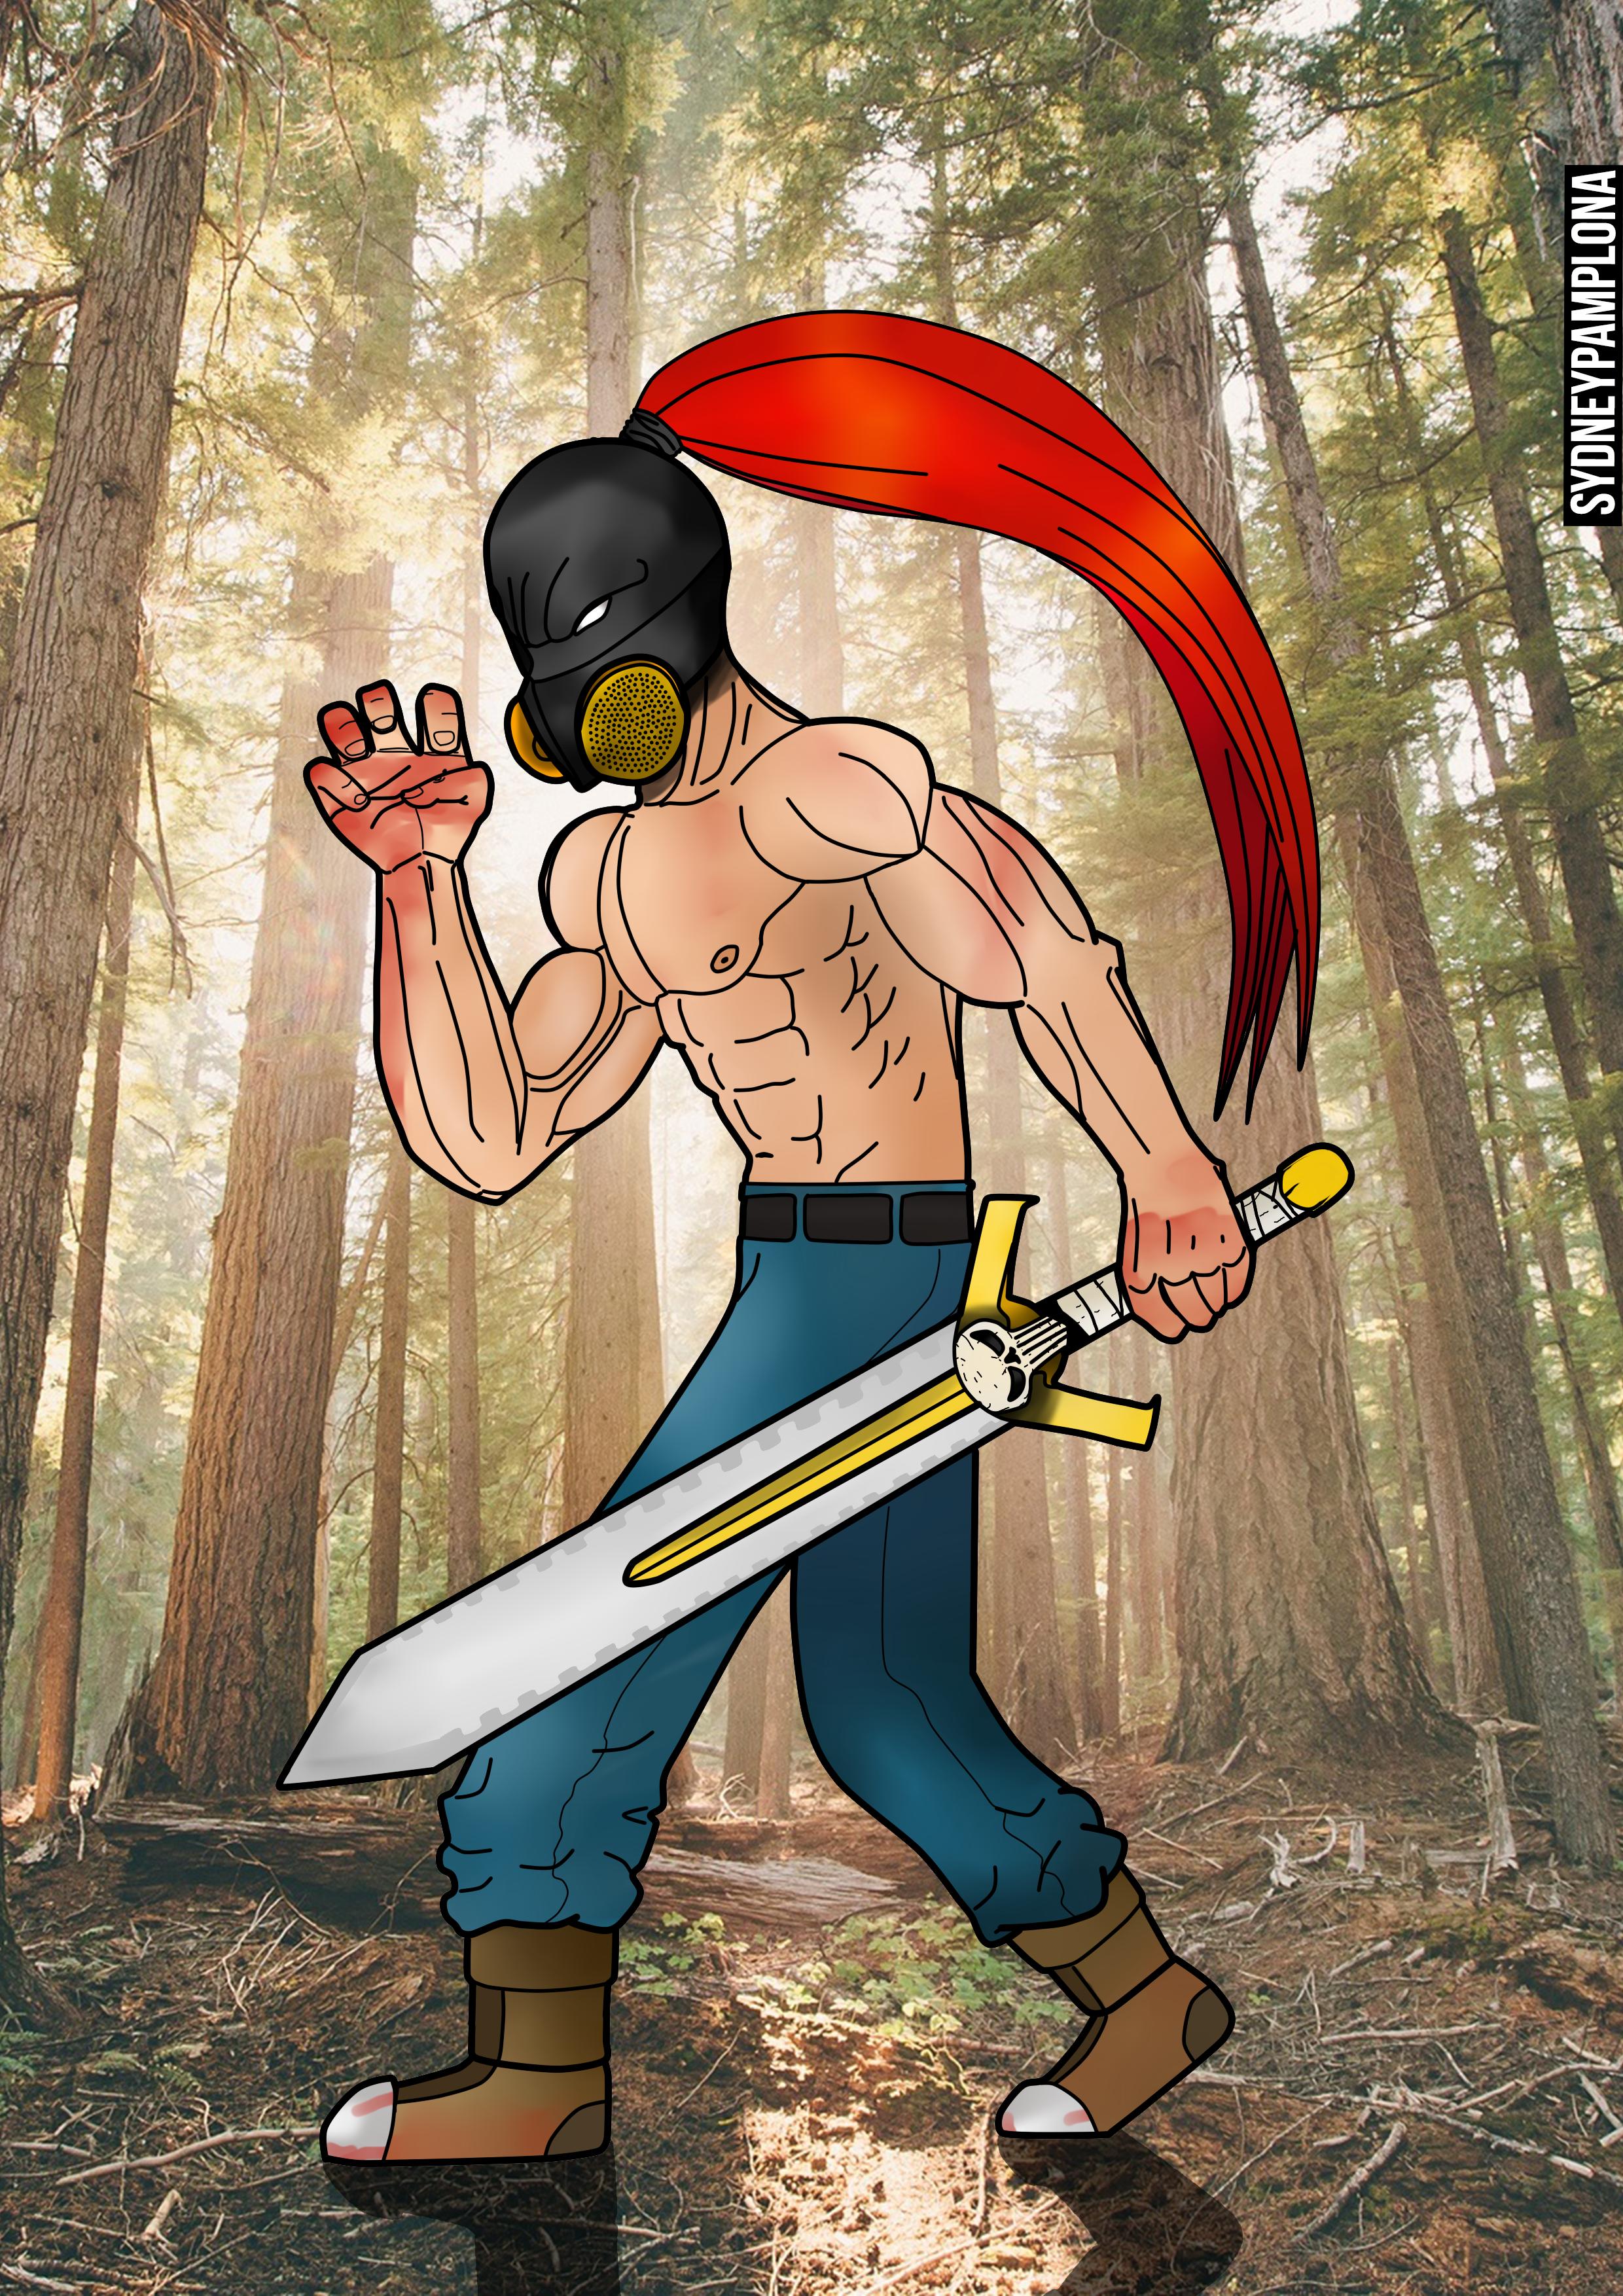 Fury Sword by sydneypamplona